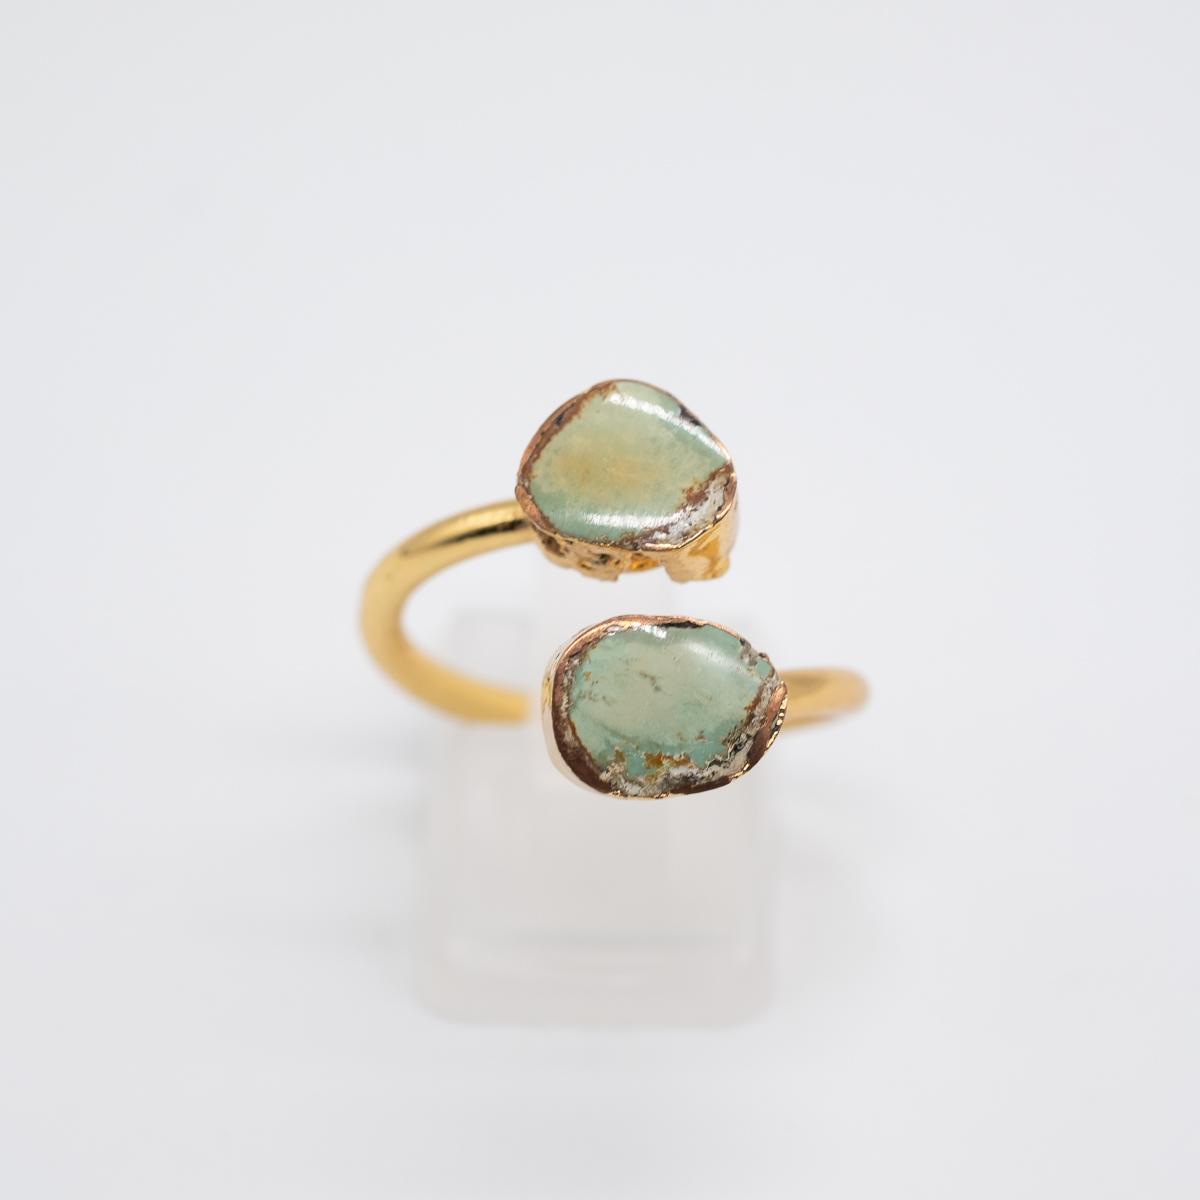 RNG-009 groene turkoois ring